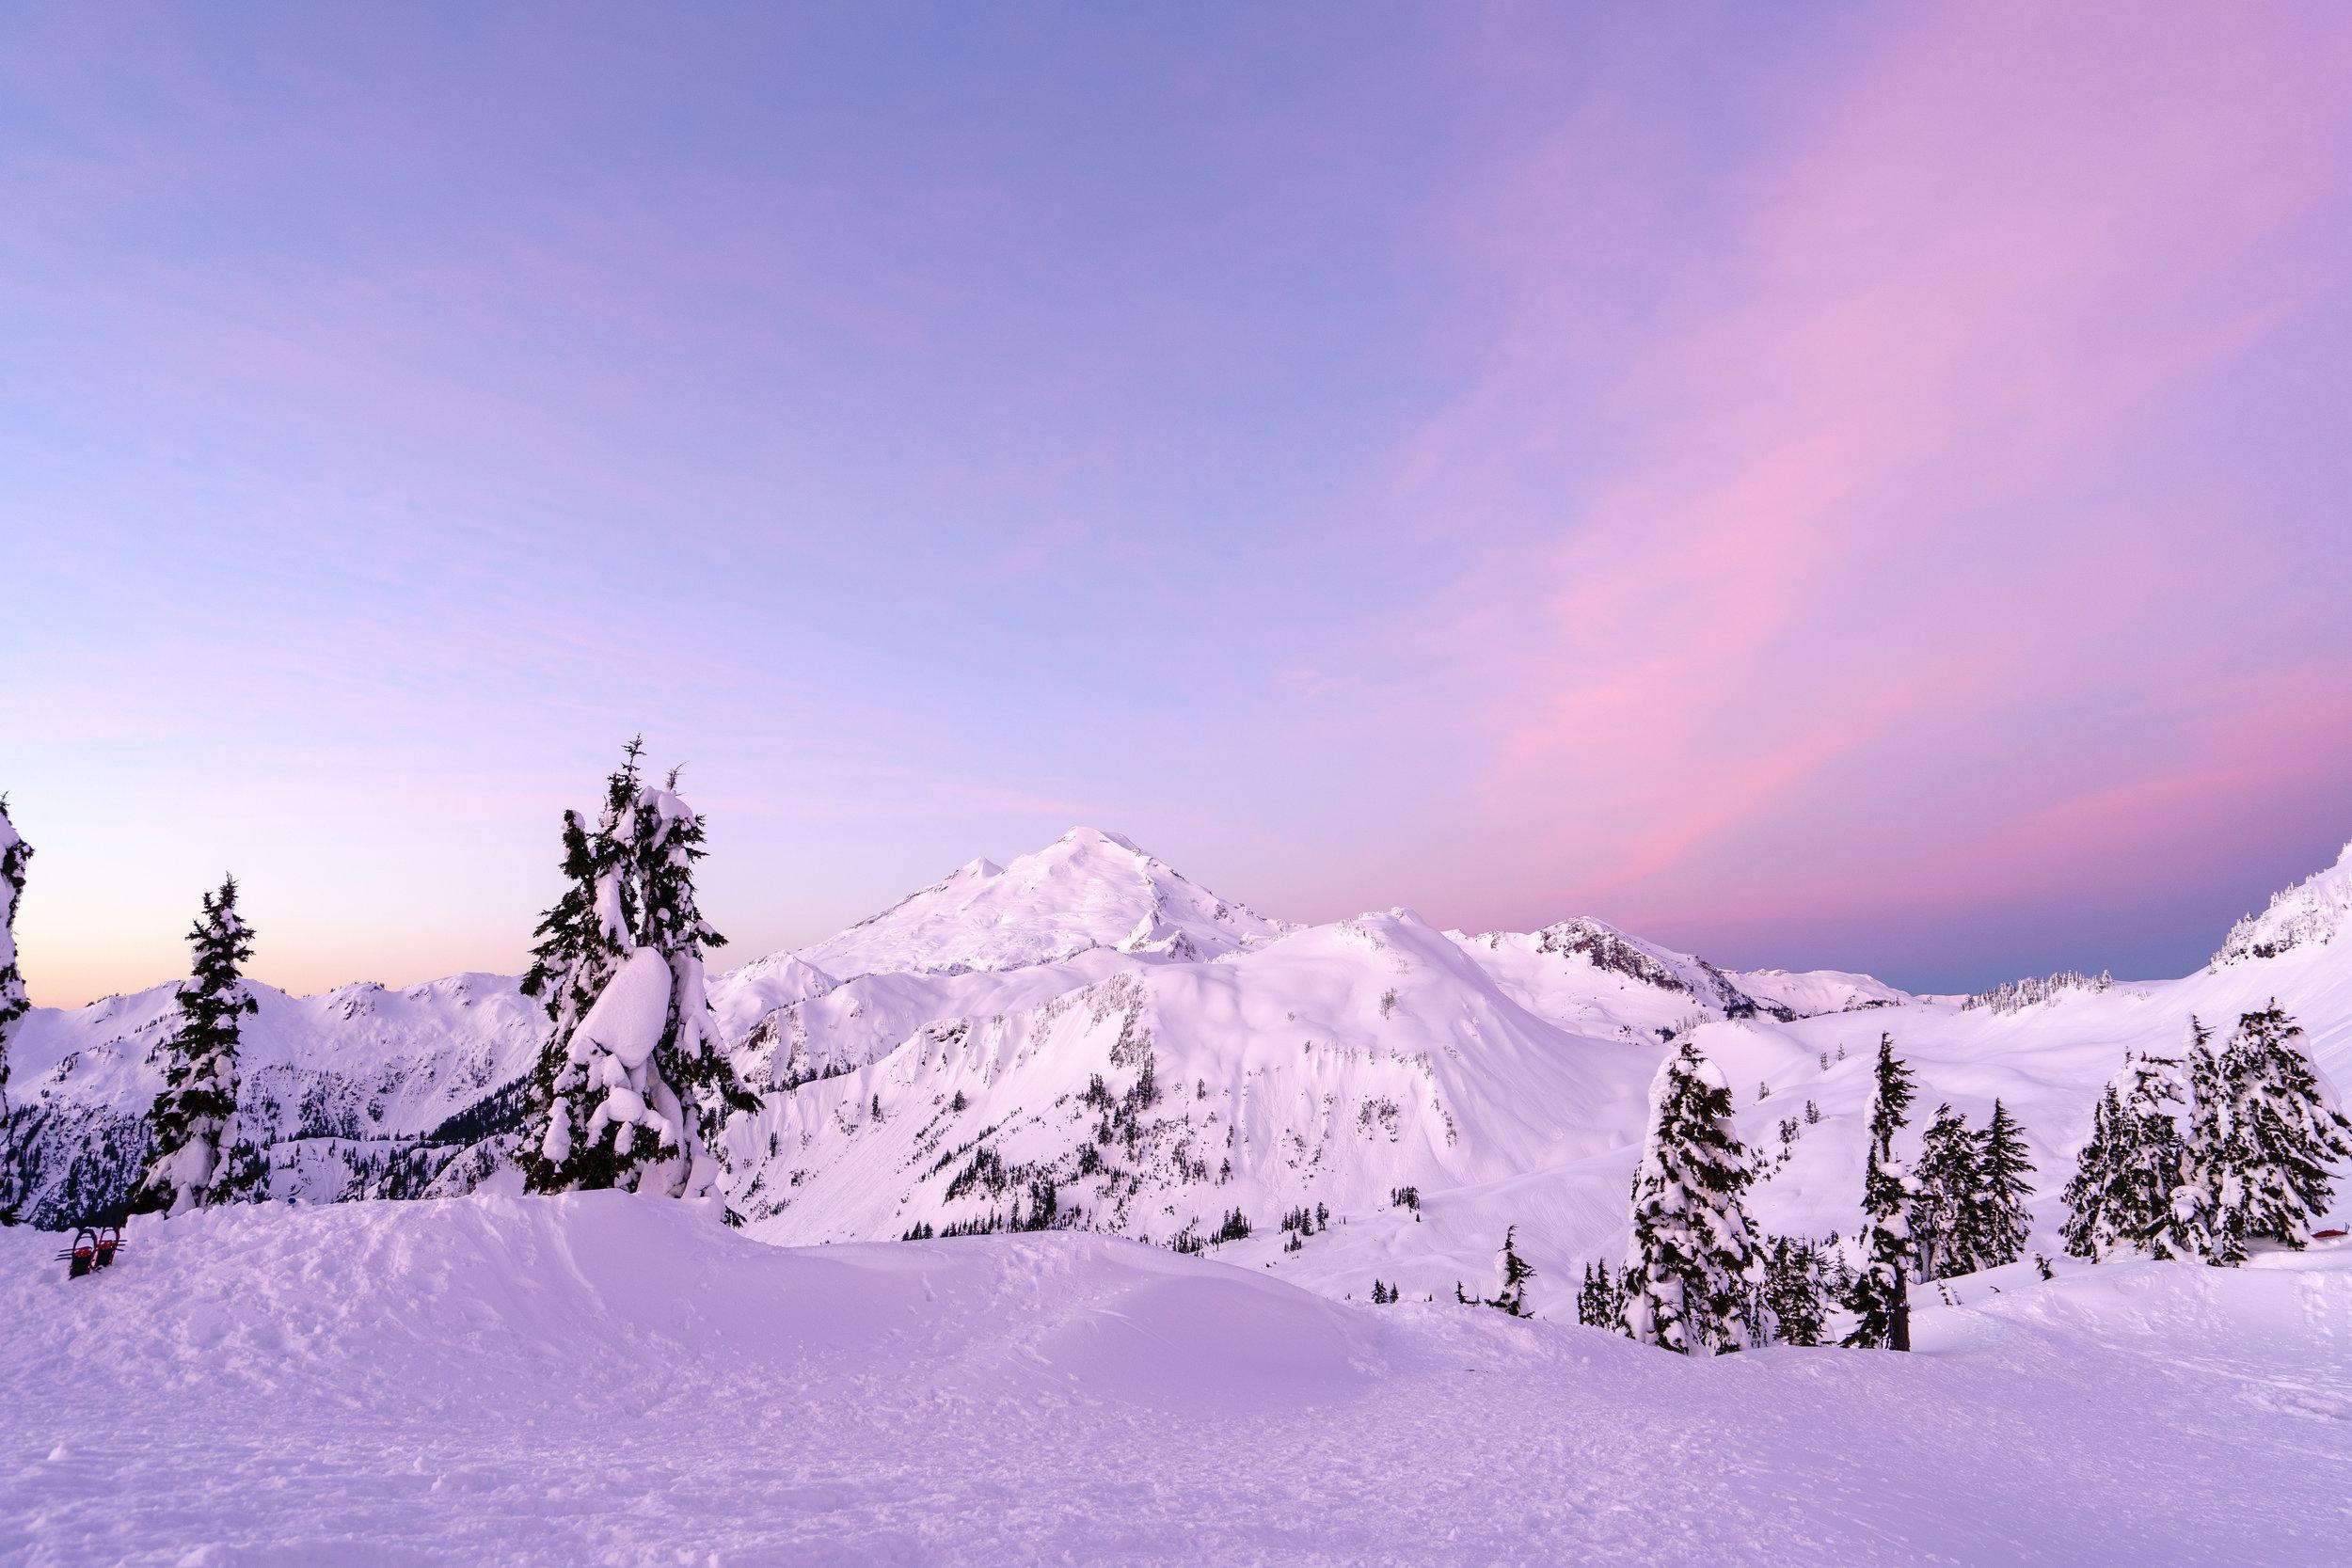 Sunrise cotton candy colors over Mt. Baker